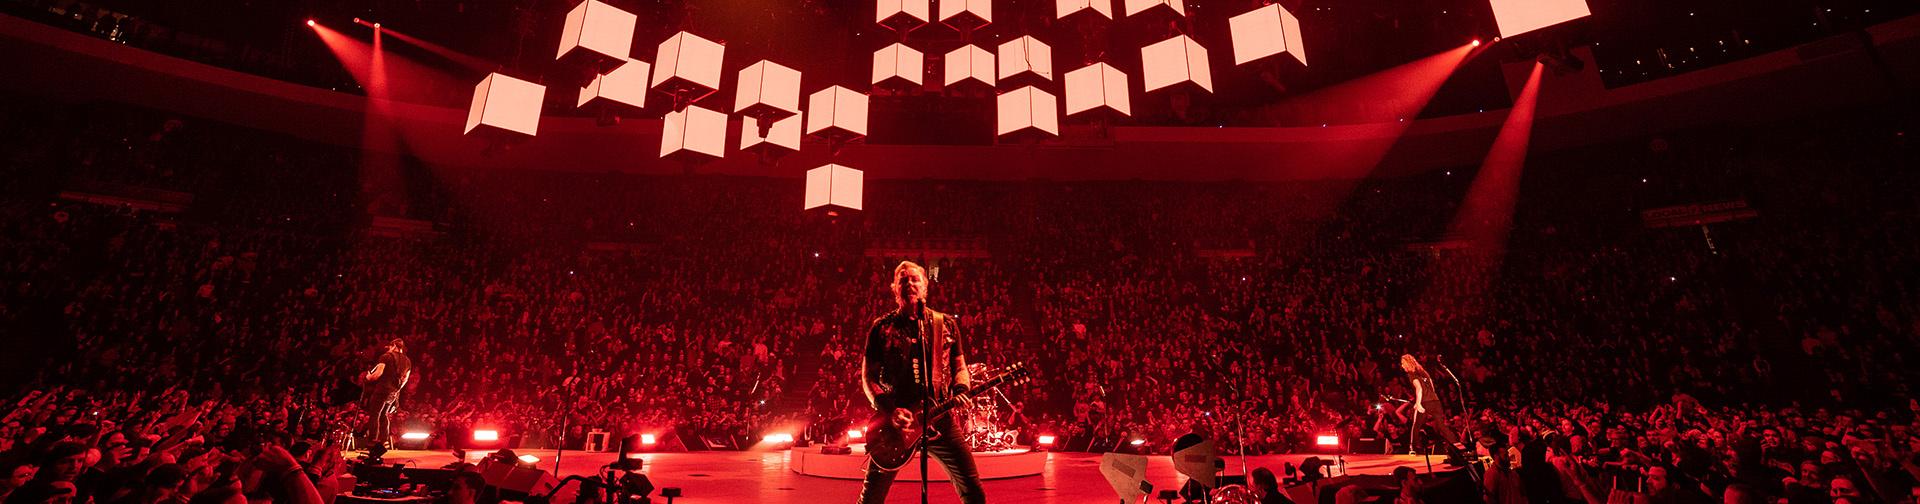 Metallica at U S  Bank Arena in Cincinnati, Ohio, United